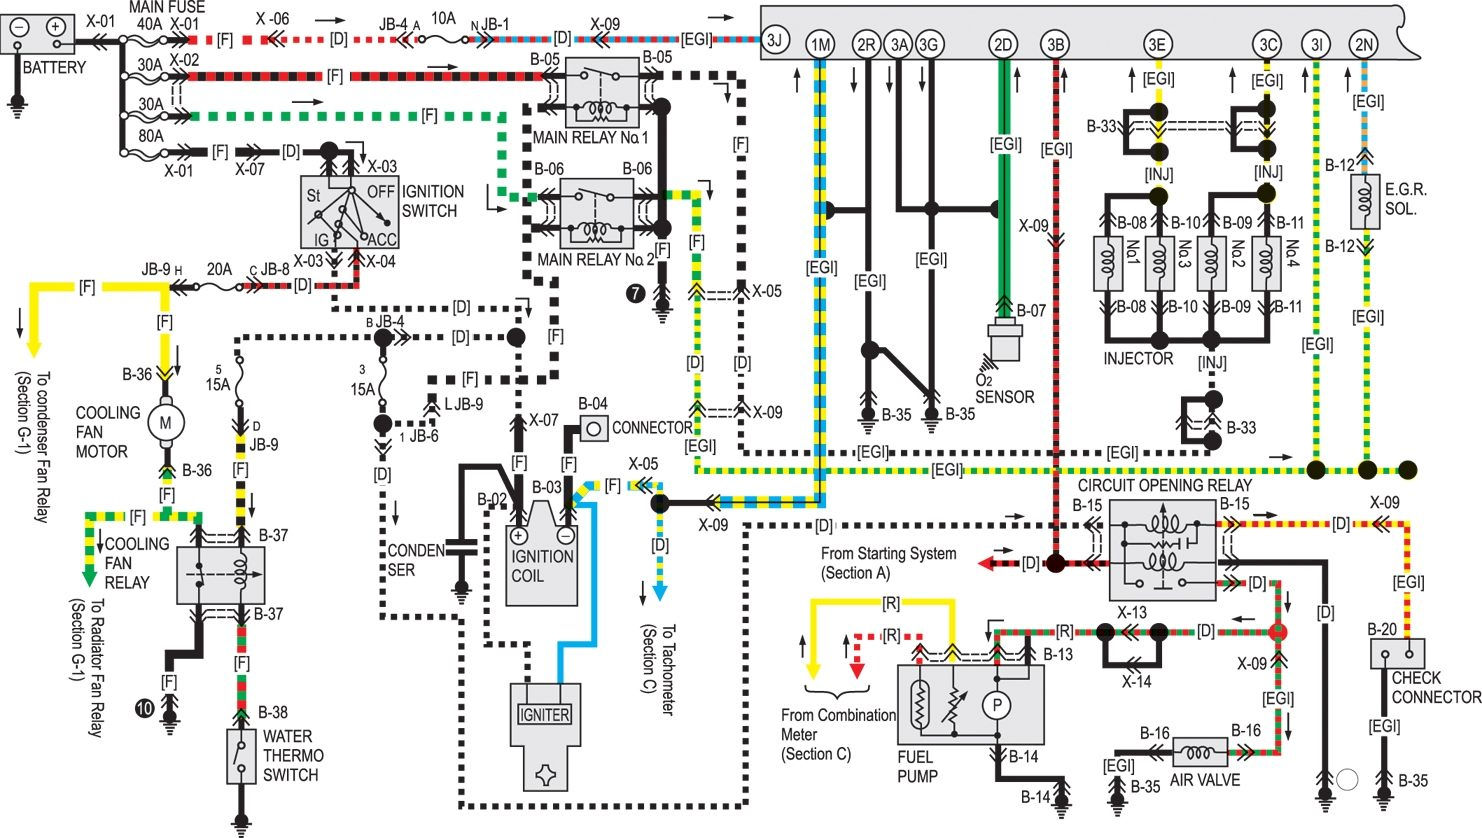 pdf ebook mazda miata 1992 ecu wiring diagrams wire center u2022 rh linxglobal co 2007 mazda 3 wiring schematics 2007 Mazda 3 Wiring Diagram Radio